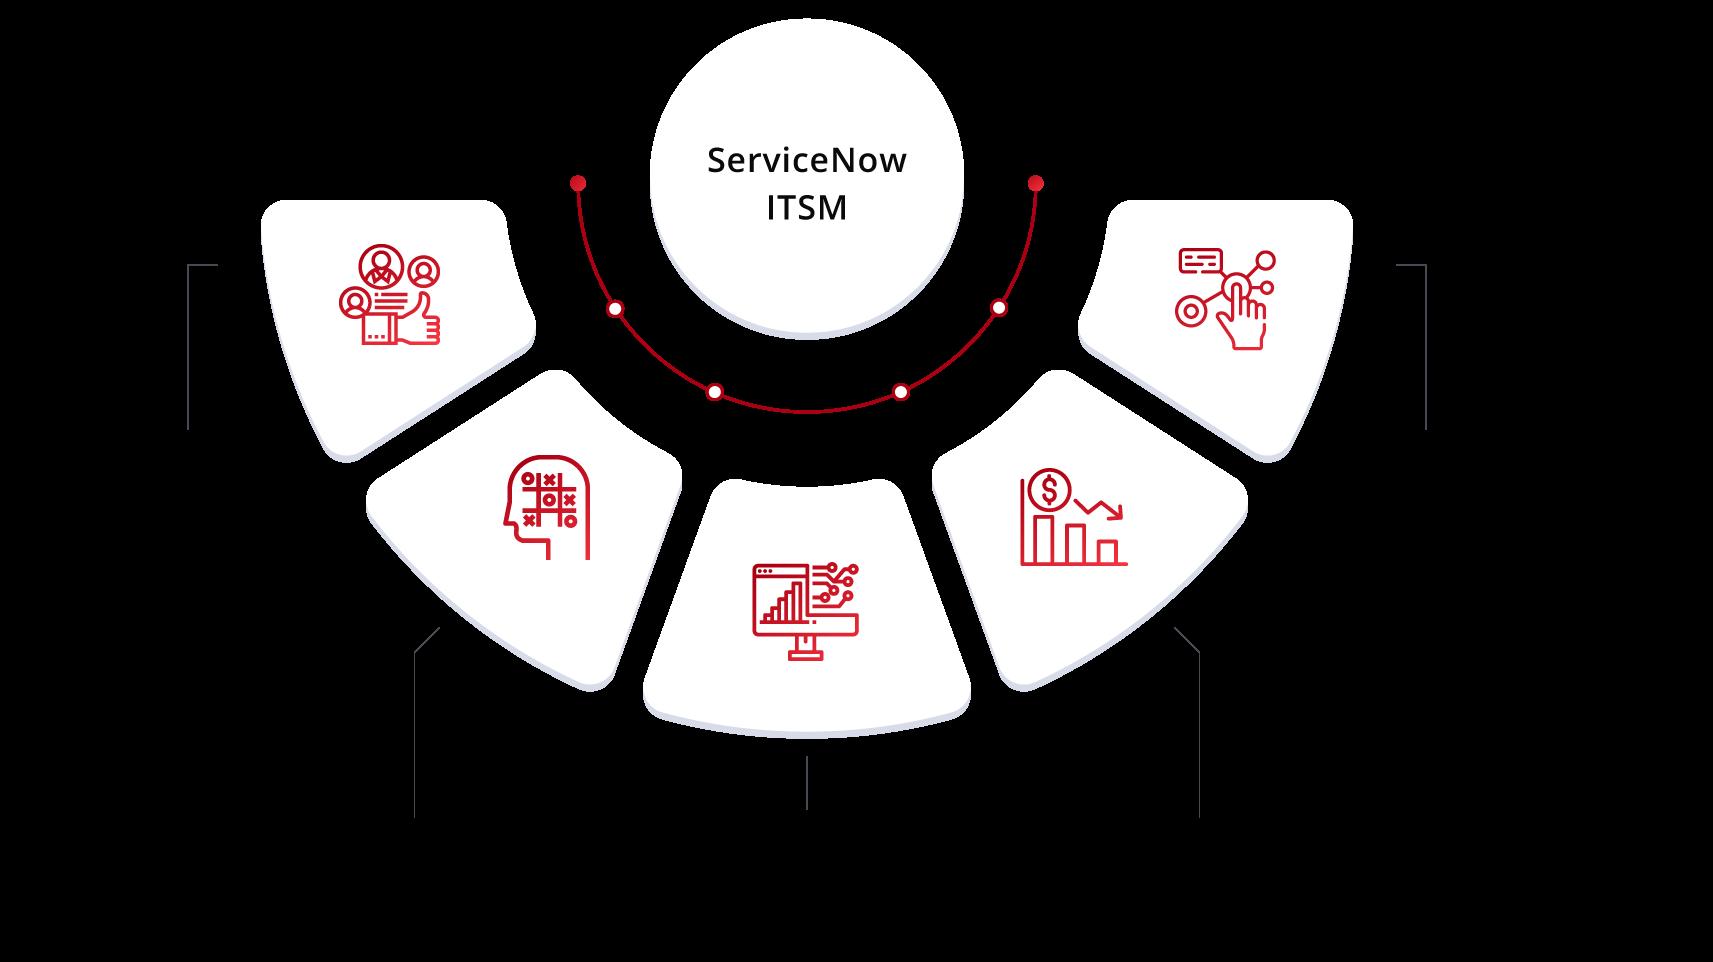 img-servicenow-itsm-benefits-qbrainx